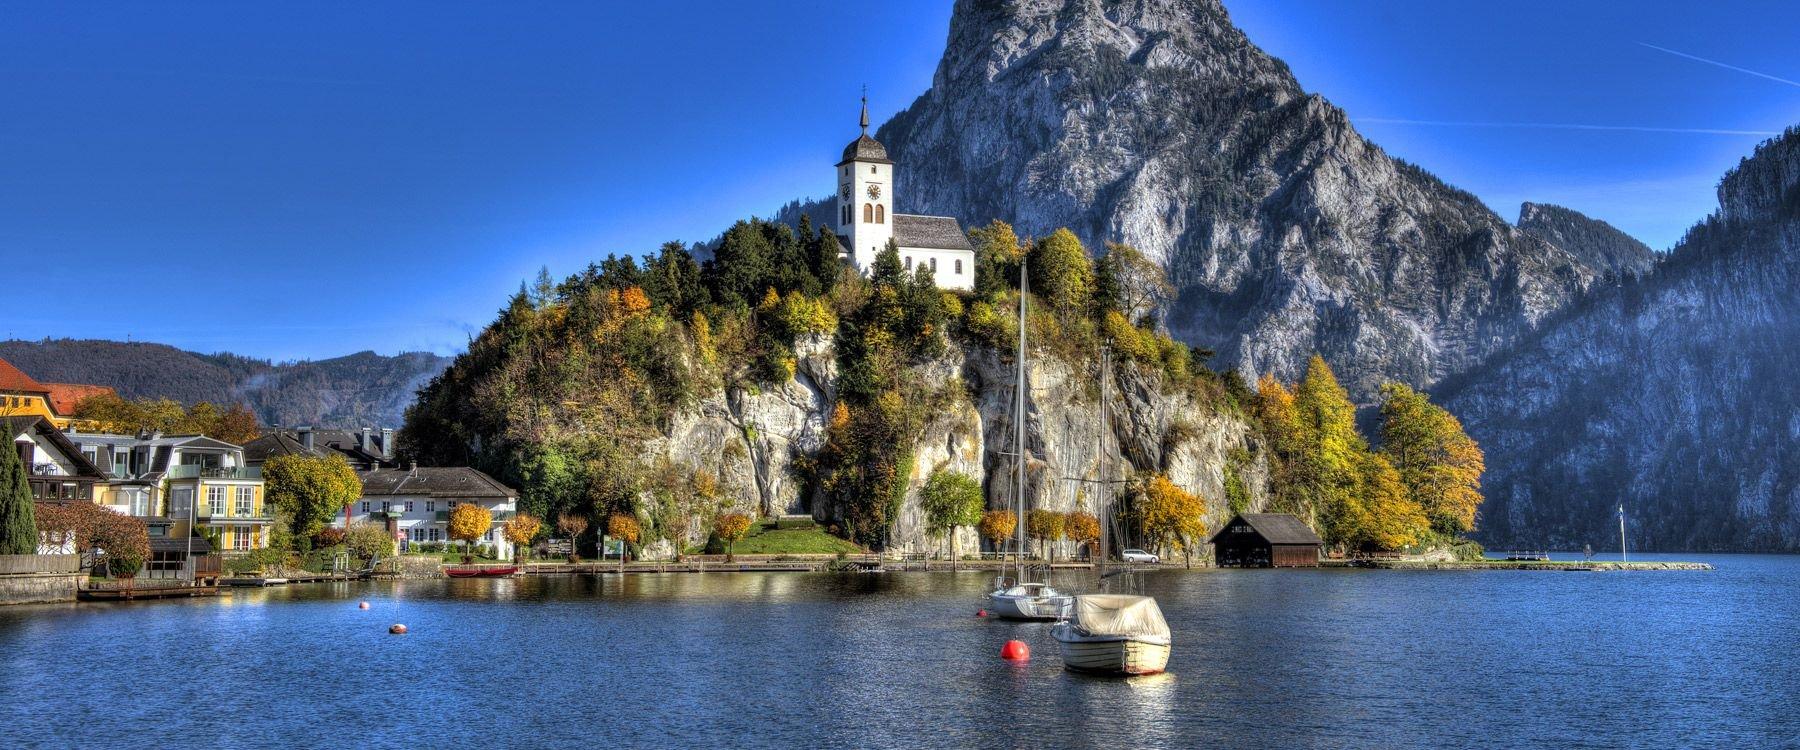 Gmunden Hotel Am See